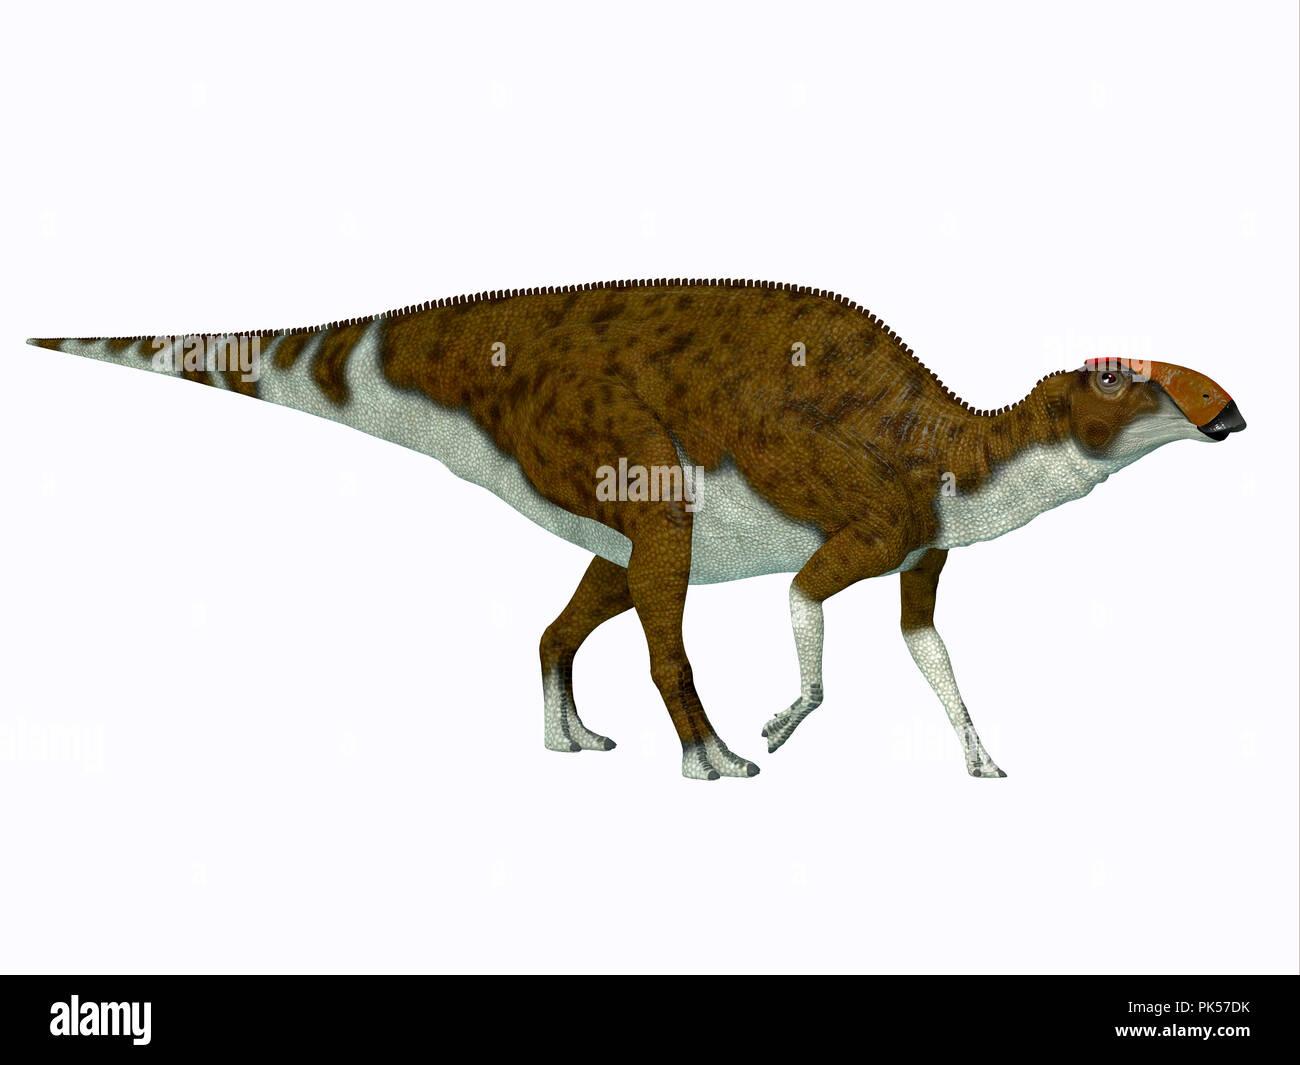 Brachylophosaurus Dinosaur - Brachylophosaurus was a herbivorous Hadrosaur dinosaur that lived during the Cretaceous Period of North America. - Stock Image